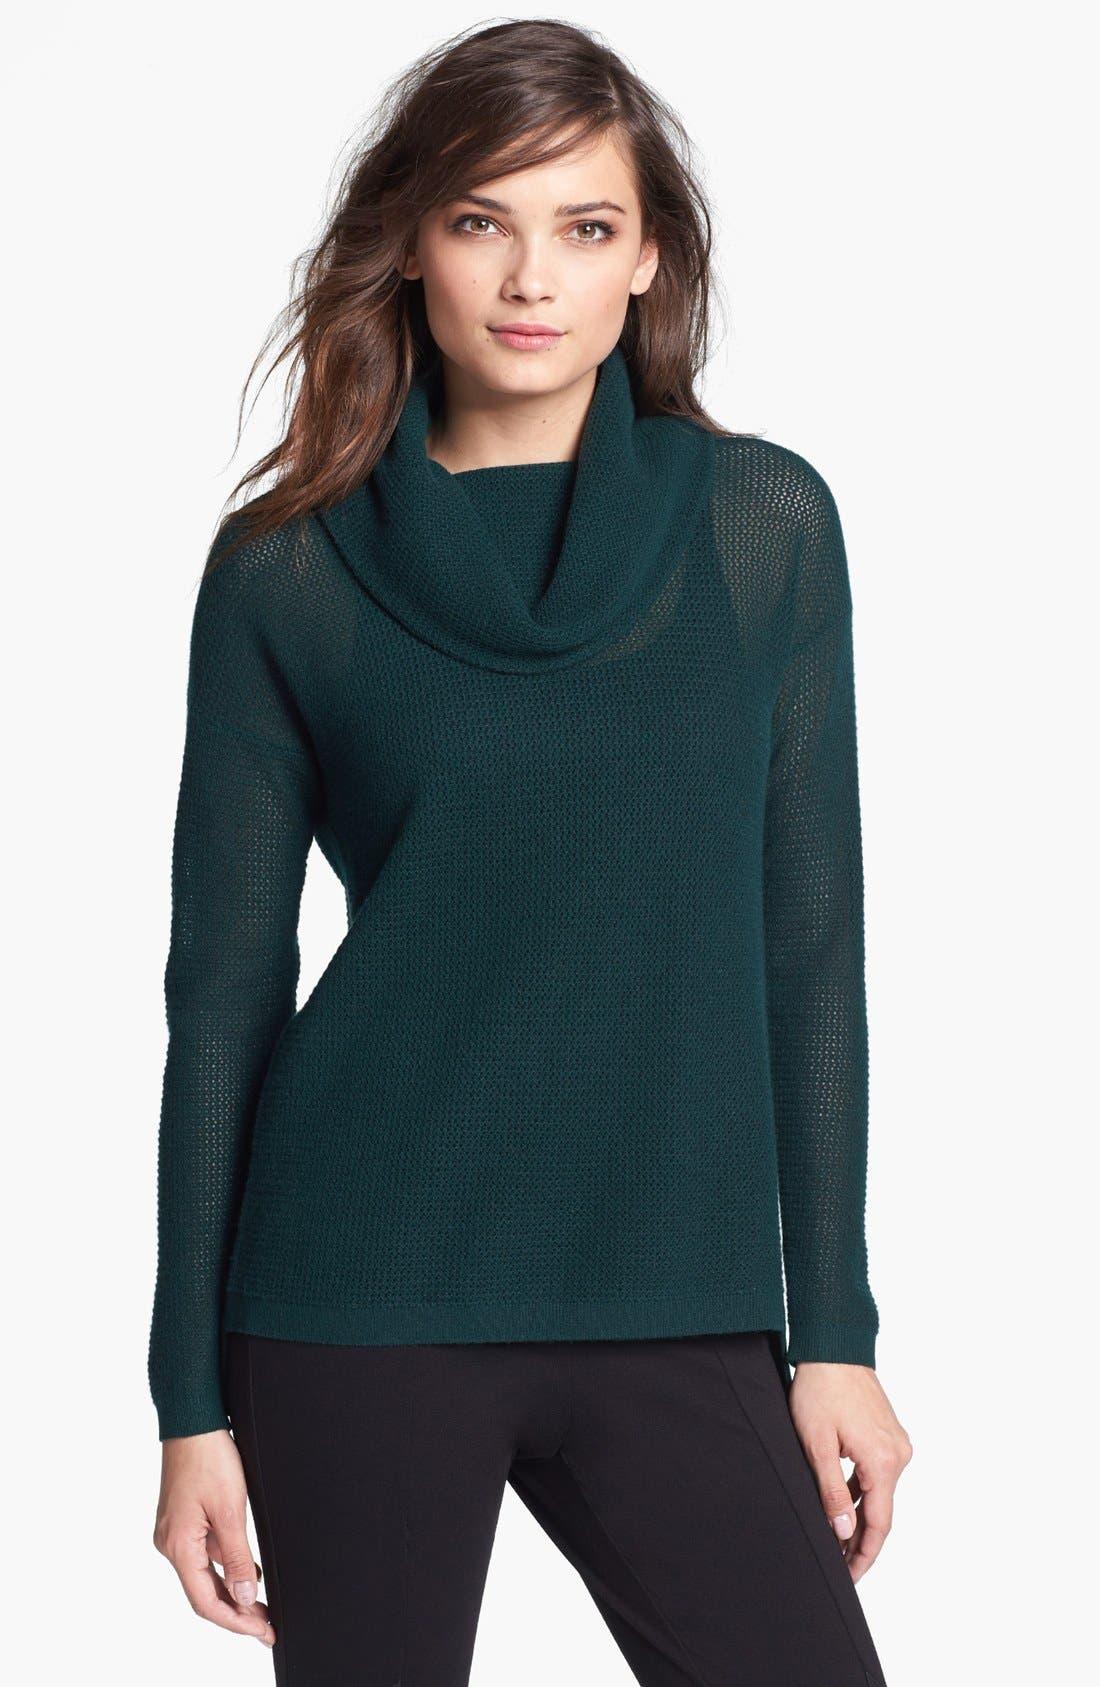 Alternate Image 1 Selected - Elie Tahari 'Nancy' Faux Wrap Back Cashmere Sweater